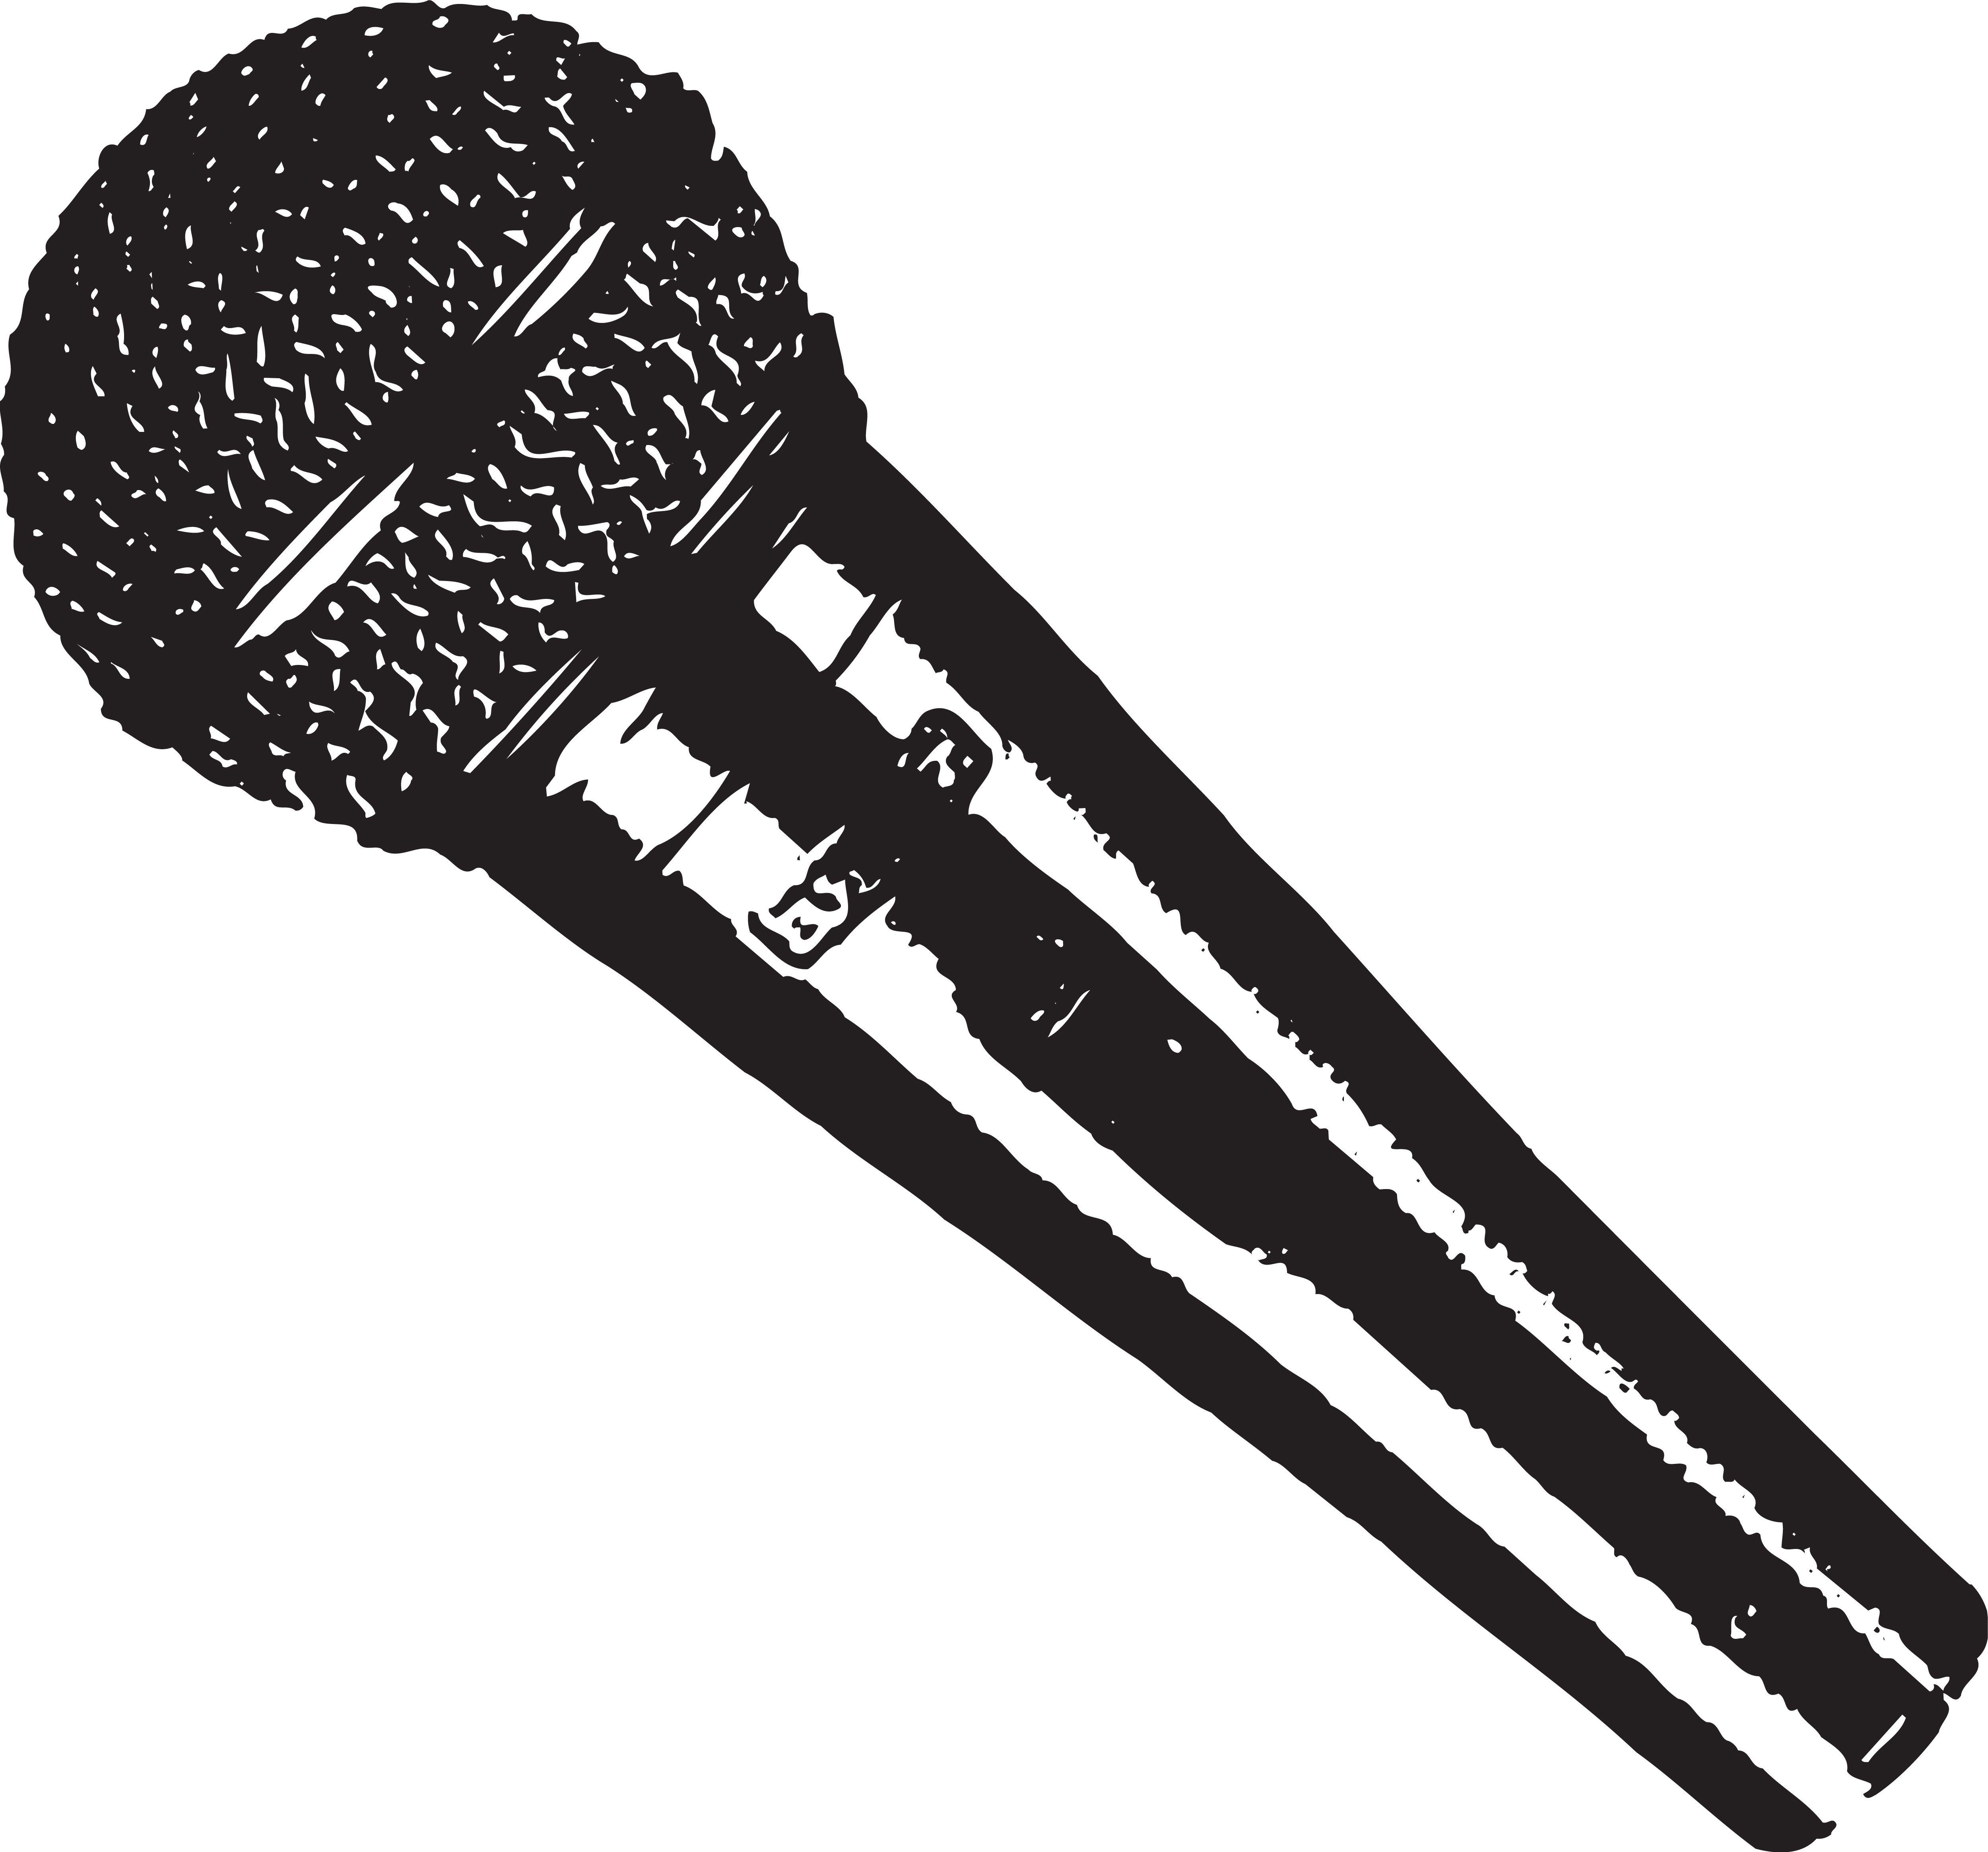 5000x4657 Microphone Vector Design Poster